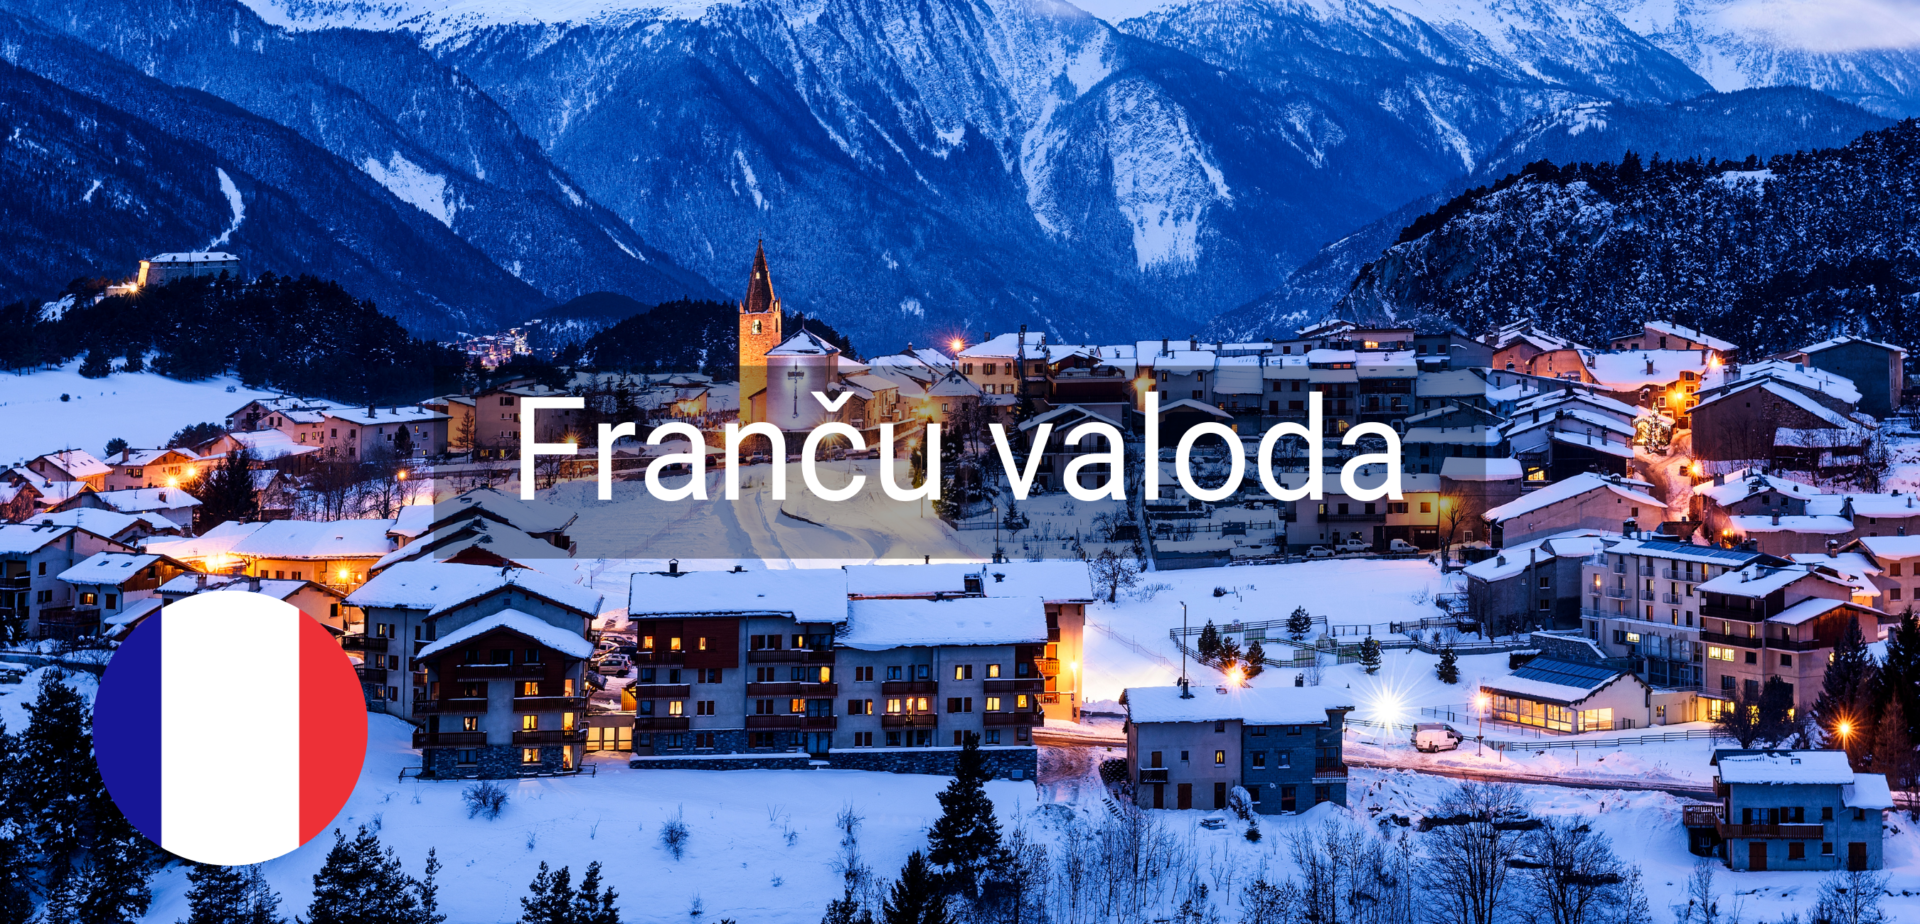 Francu valoda valmiera valodu mape vidzeme online kursi grupa